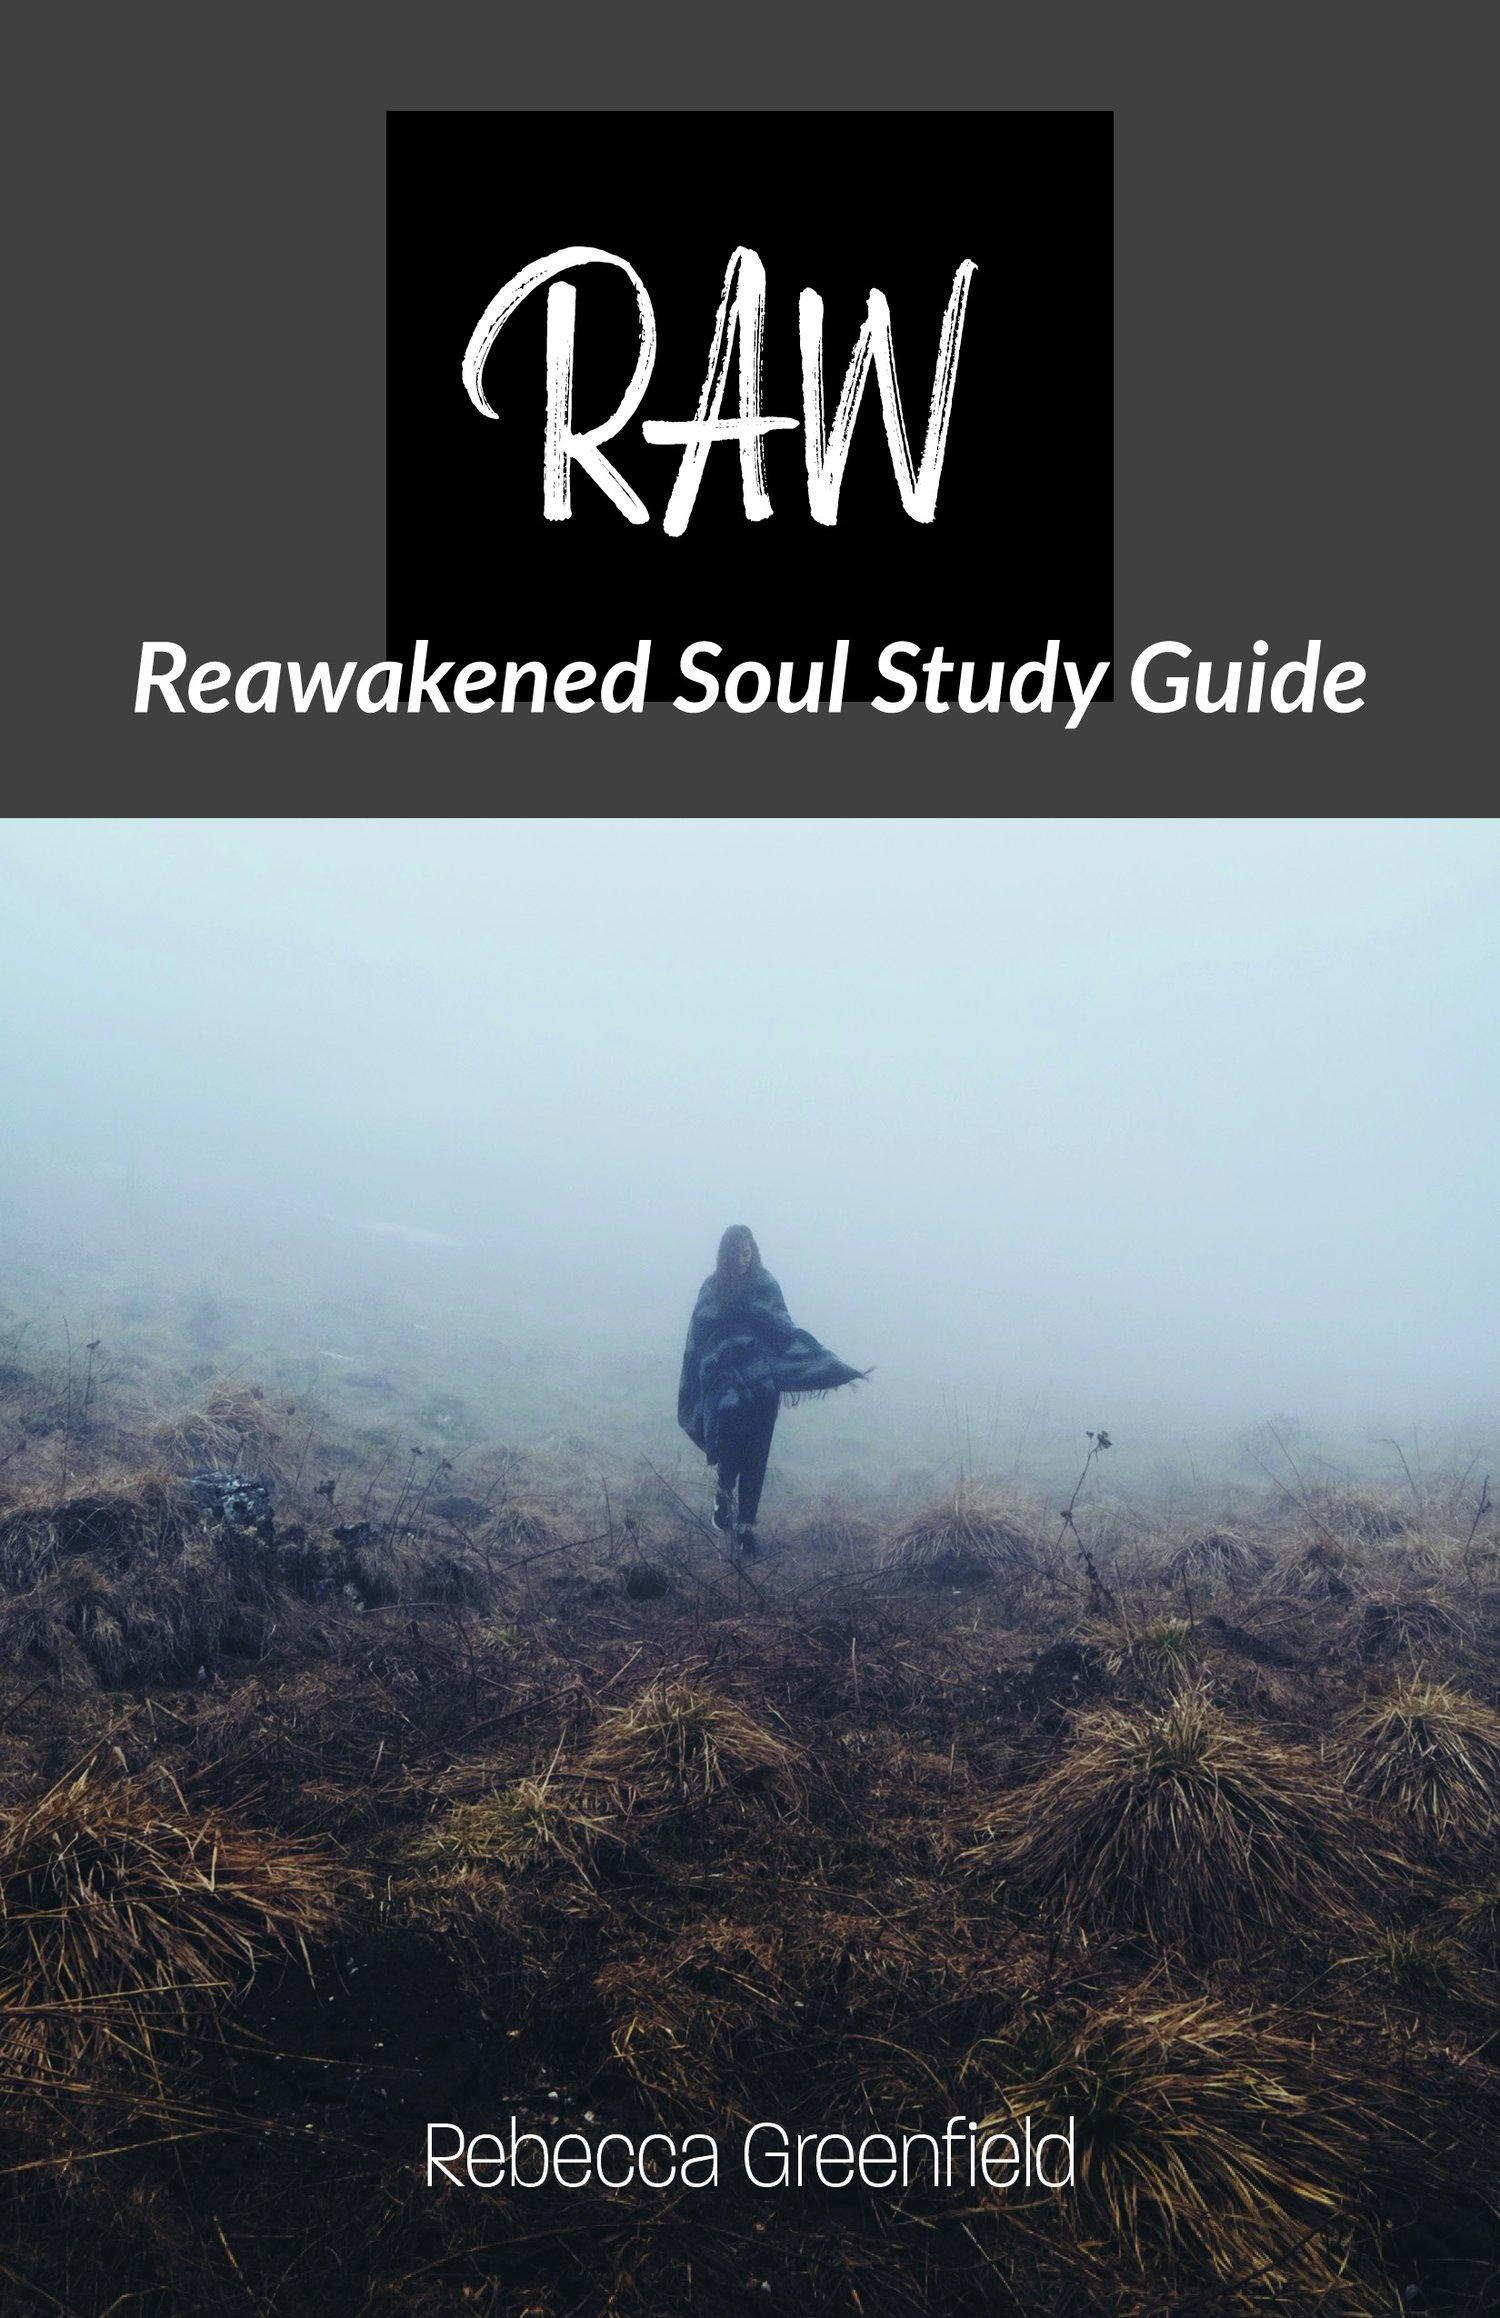 Image of RAW Reawakened Soul STUDY GUIDE